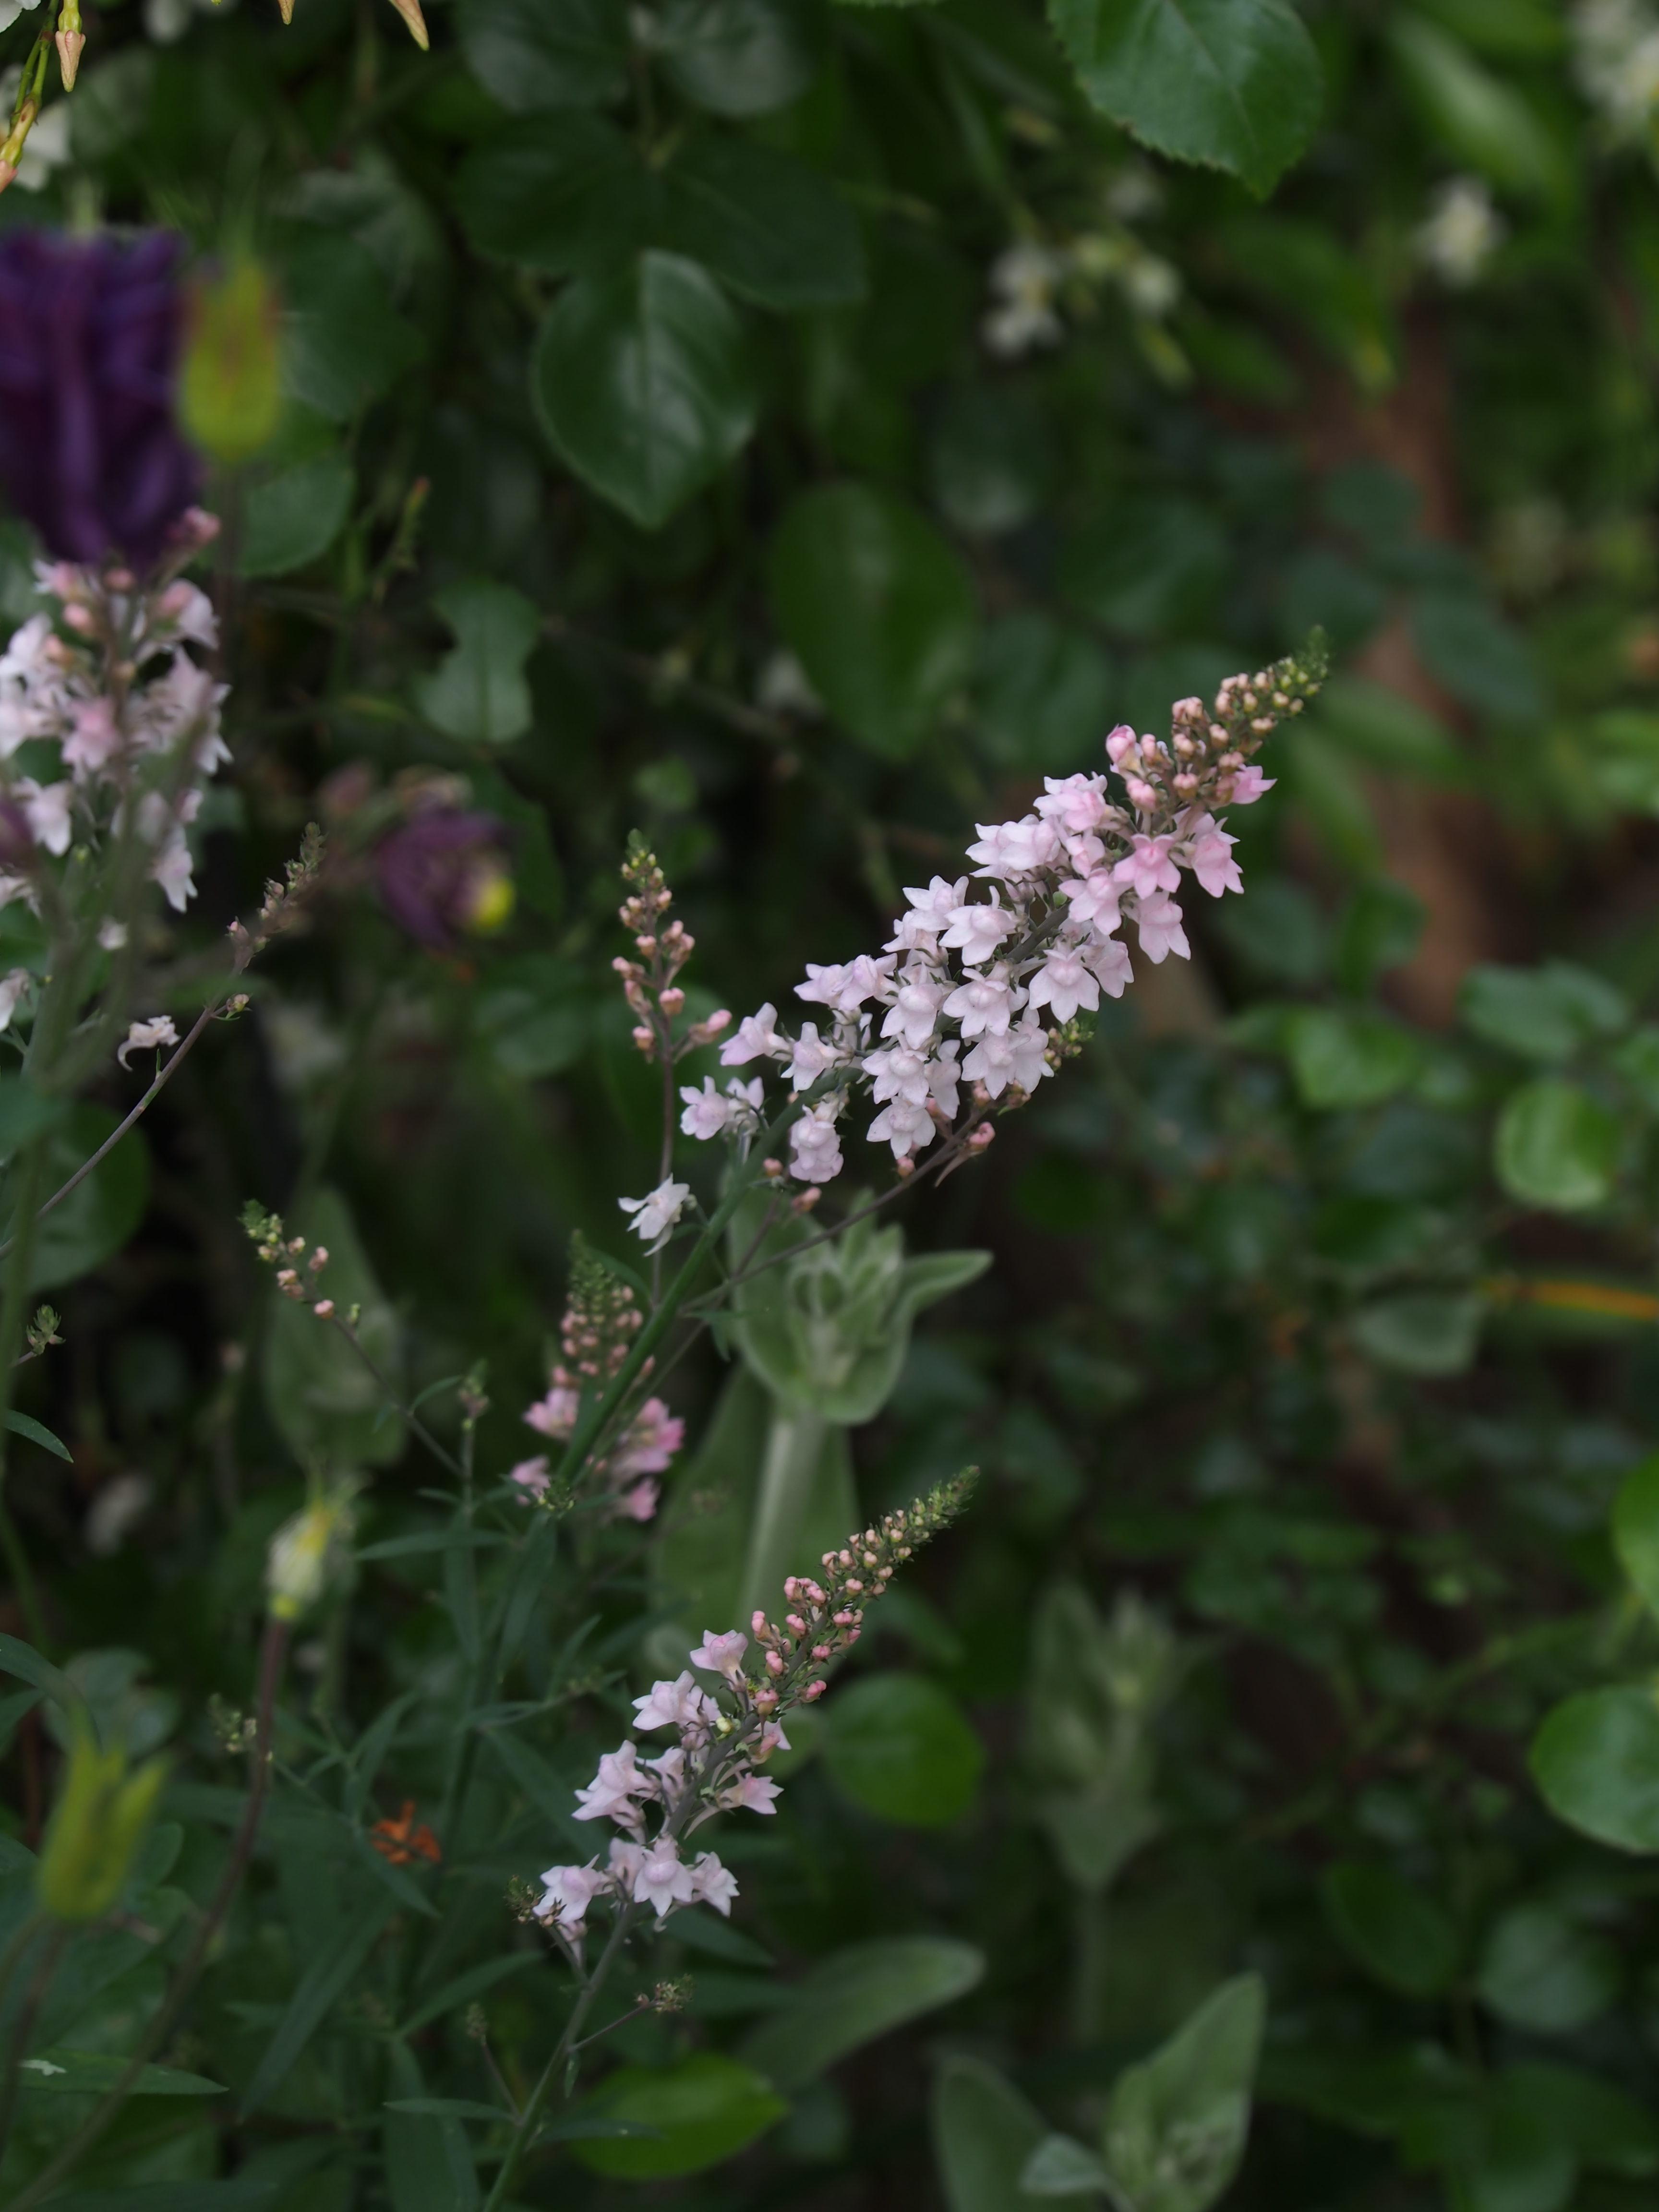 Linaria purpurea 'Canon J. Went' リナリア プルプレア 'キャノンジェイウェント' (宿根リナリア)